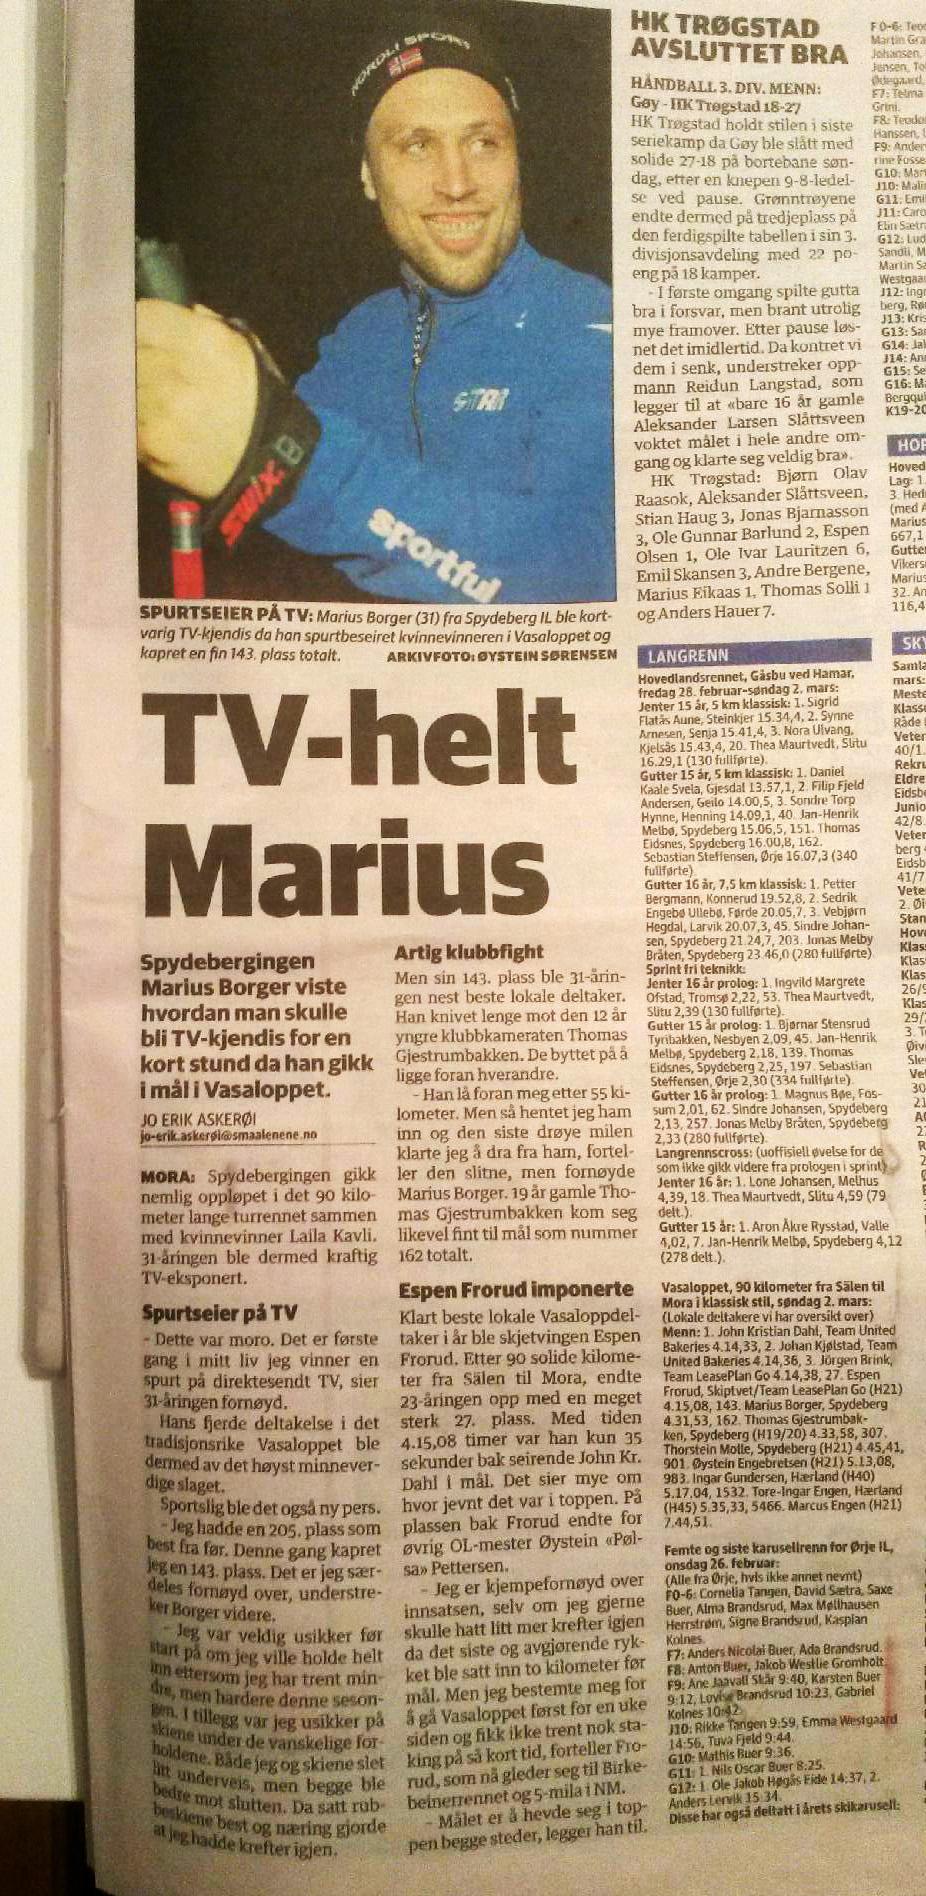 Vasaloppet2014_MariusBorger-avisklipp